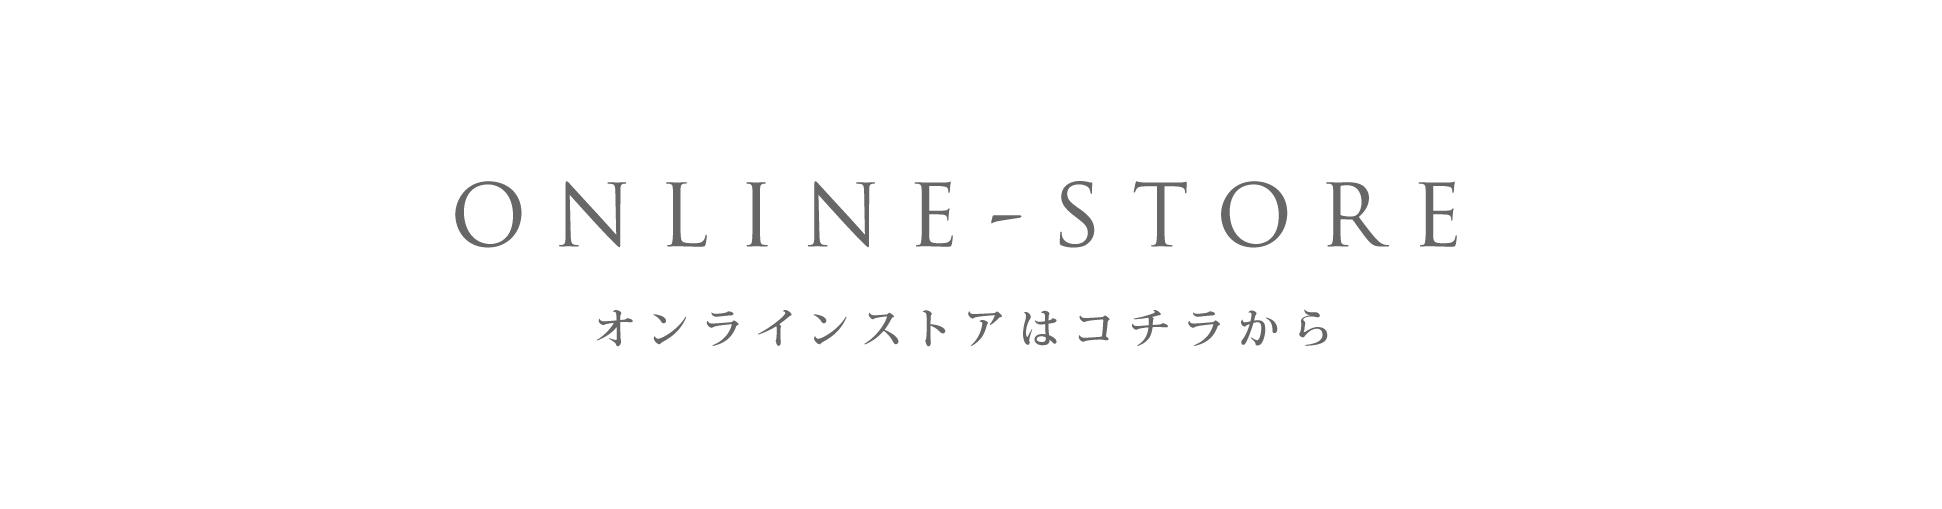 ONLINE STORE - オンラインストアはコチラから